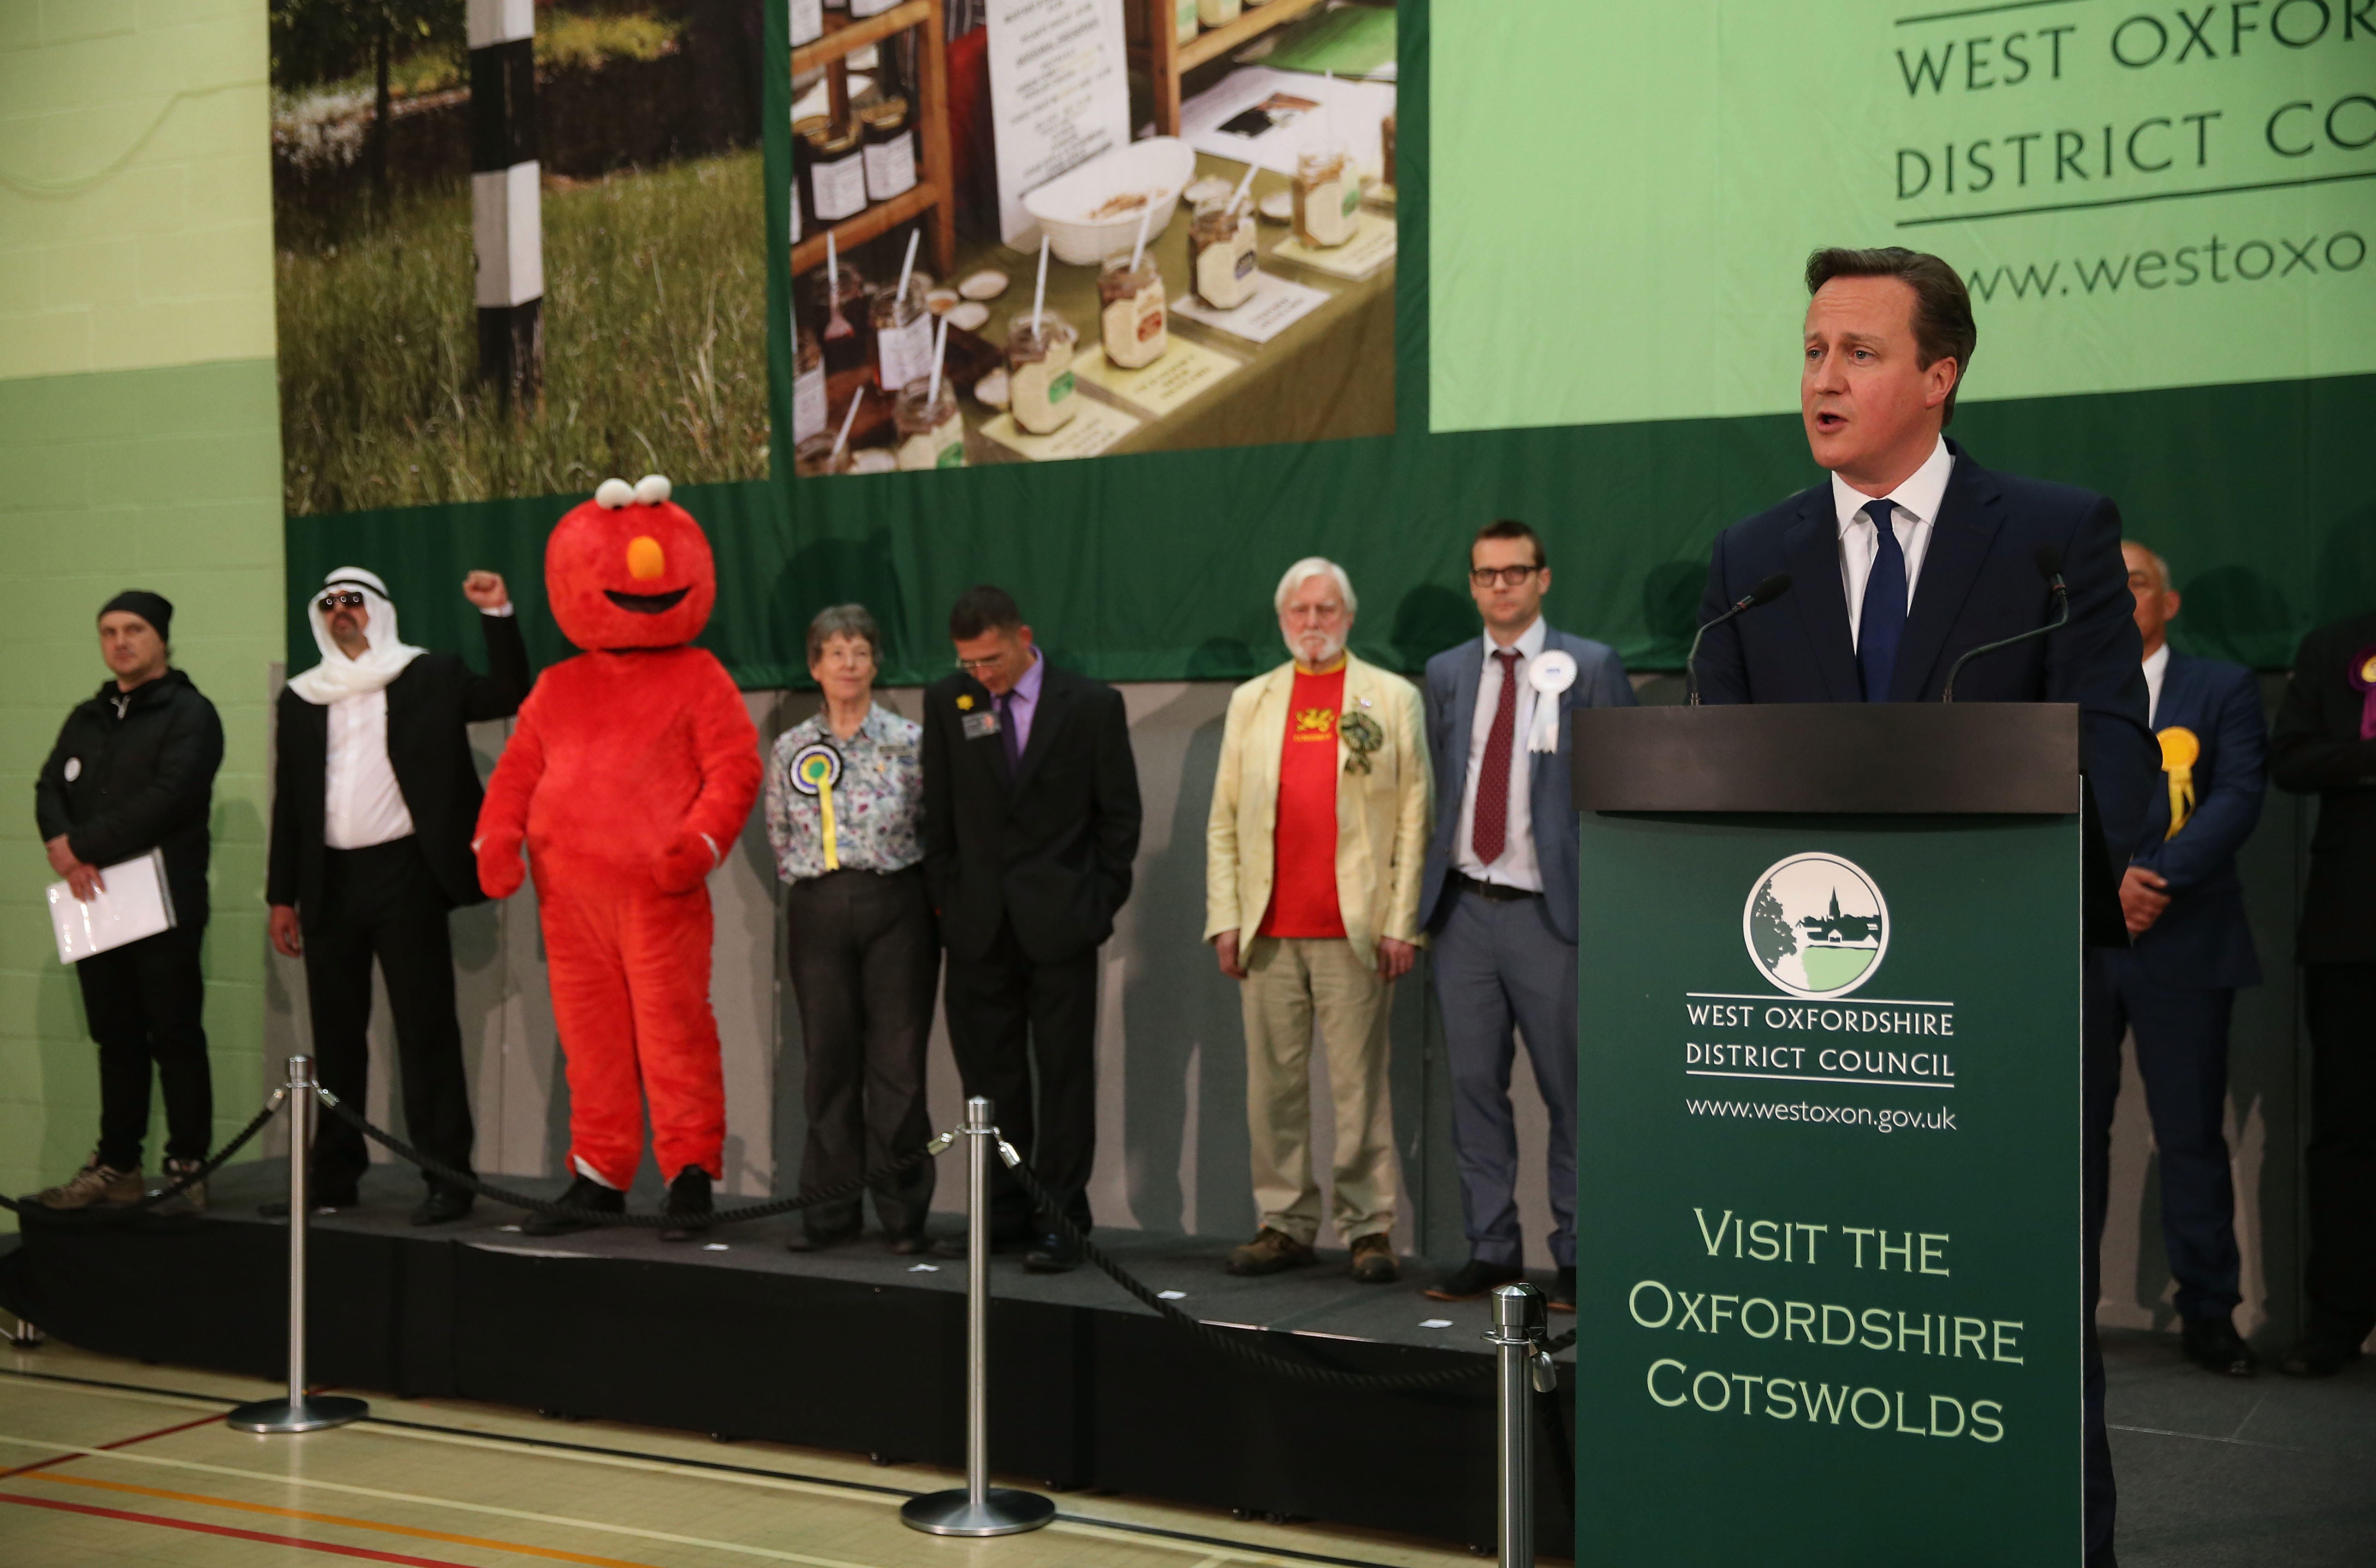 La peculiar noche electoral británica